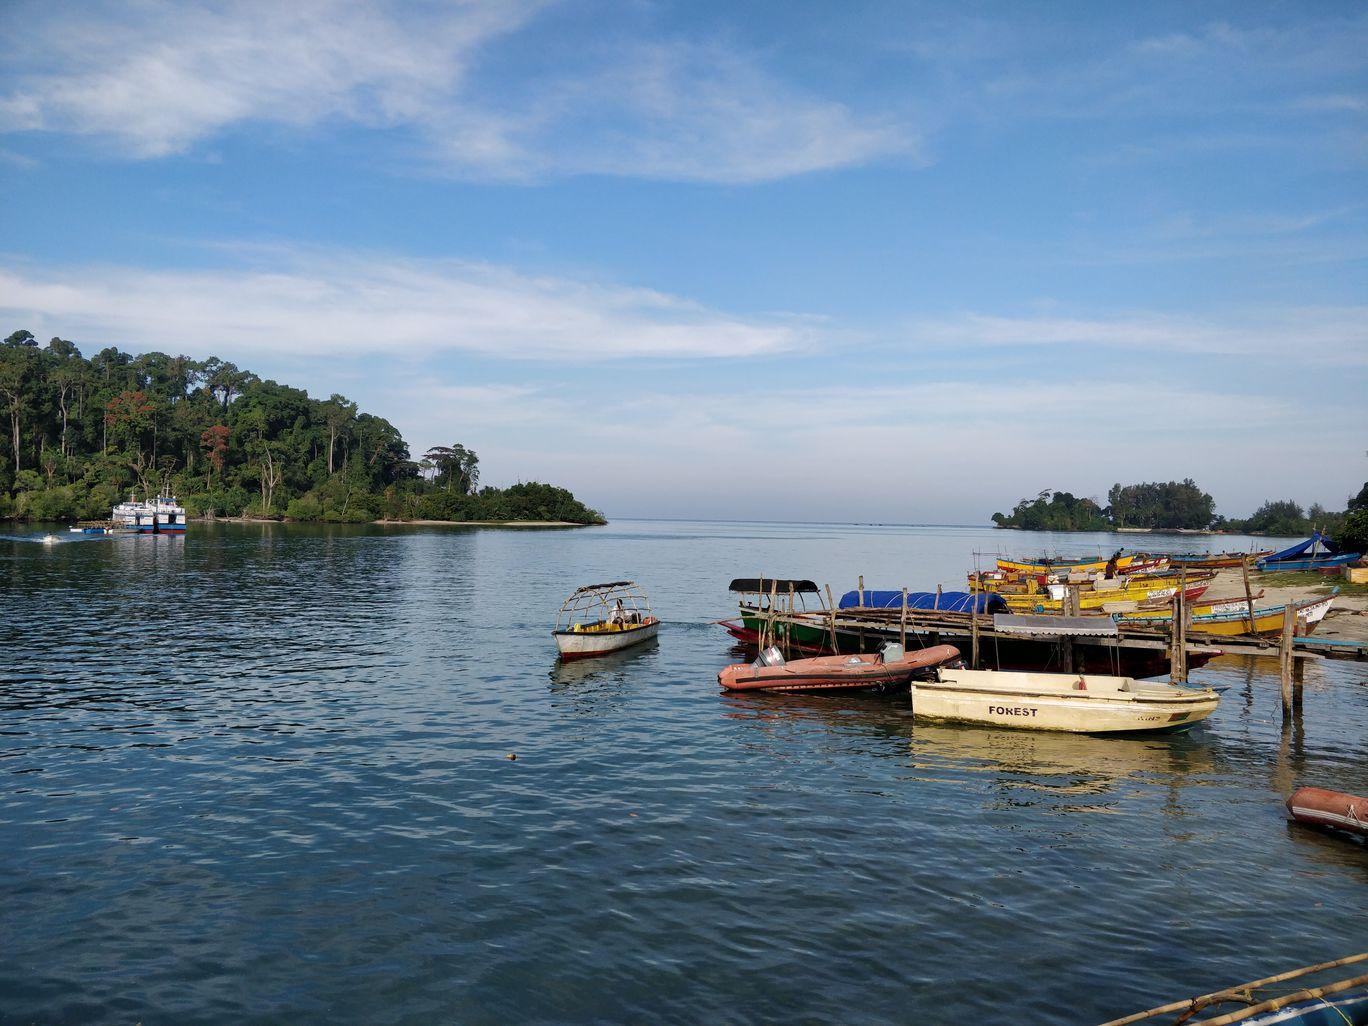 Photo of Andaman and Nicobar Islands By Reshma Raut